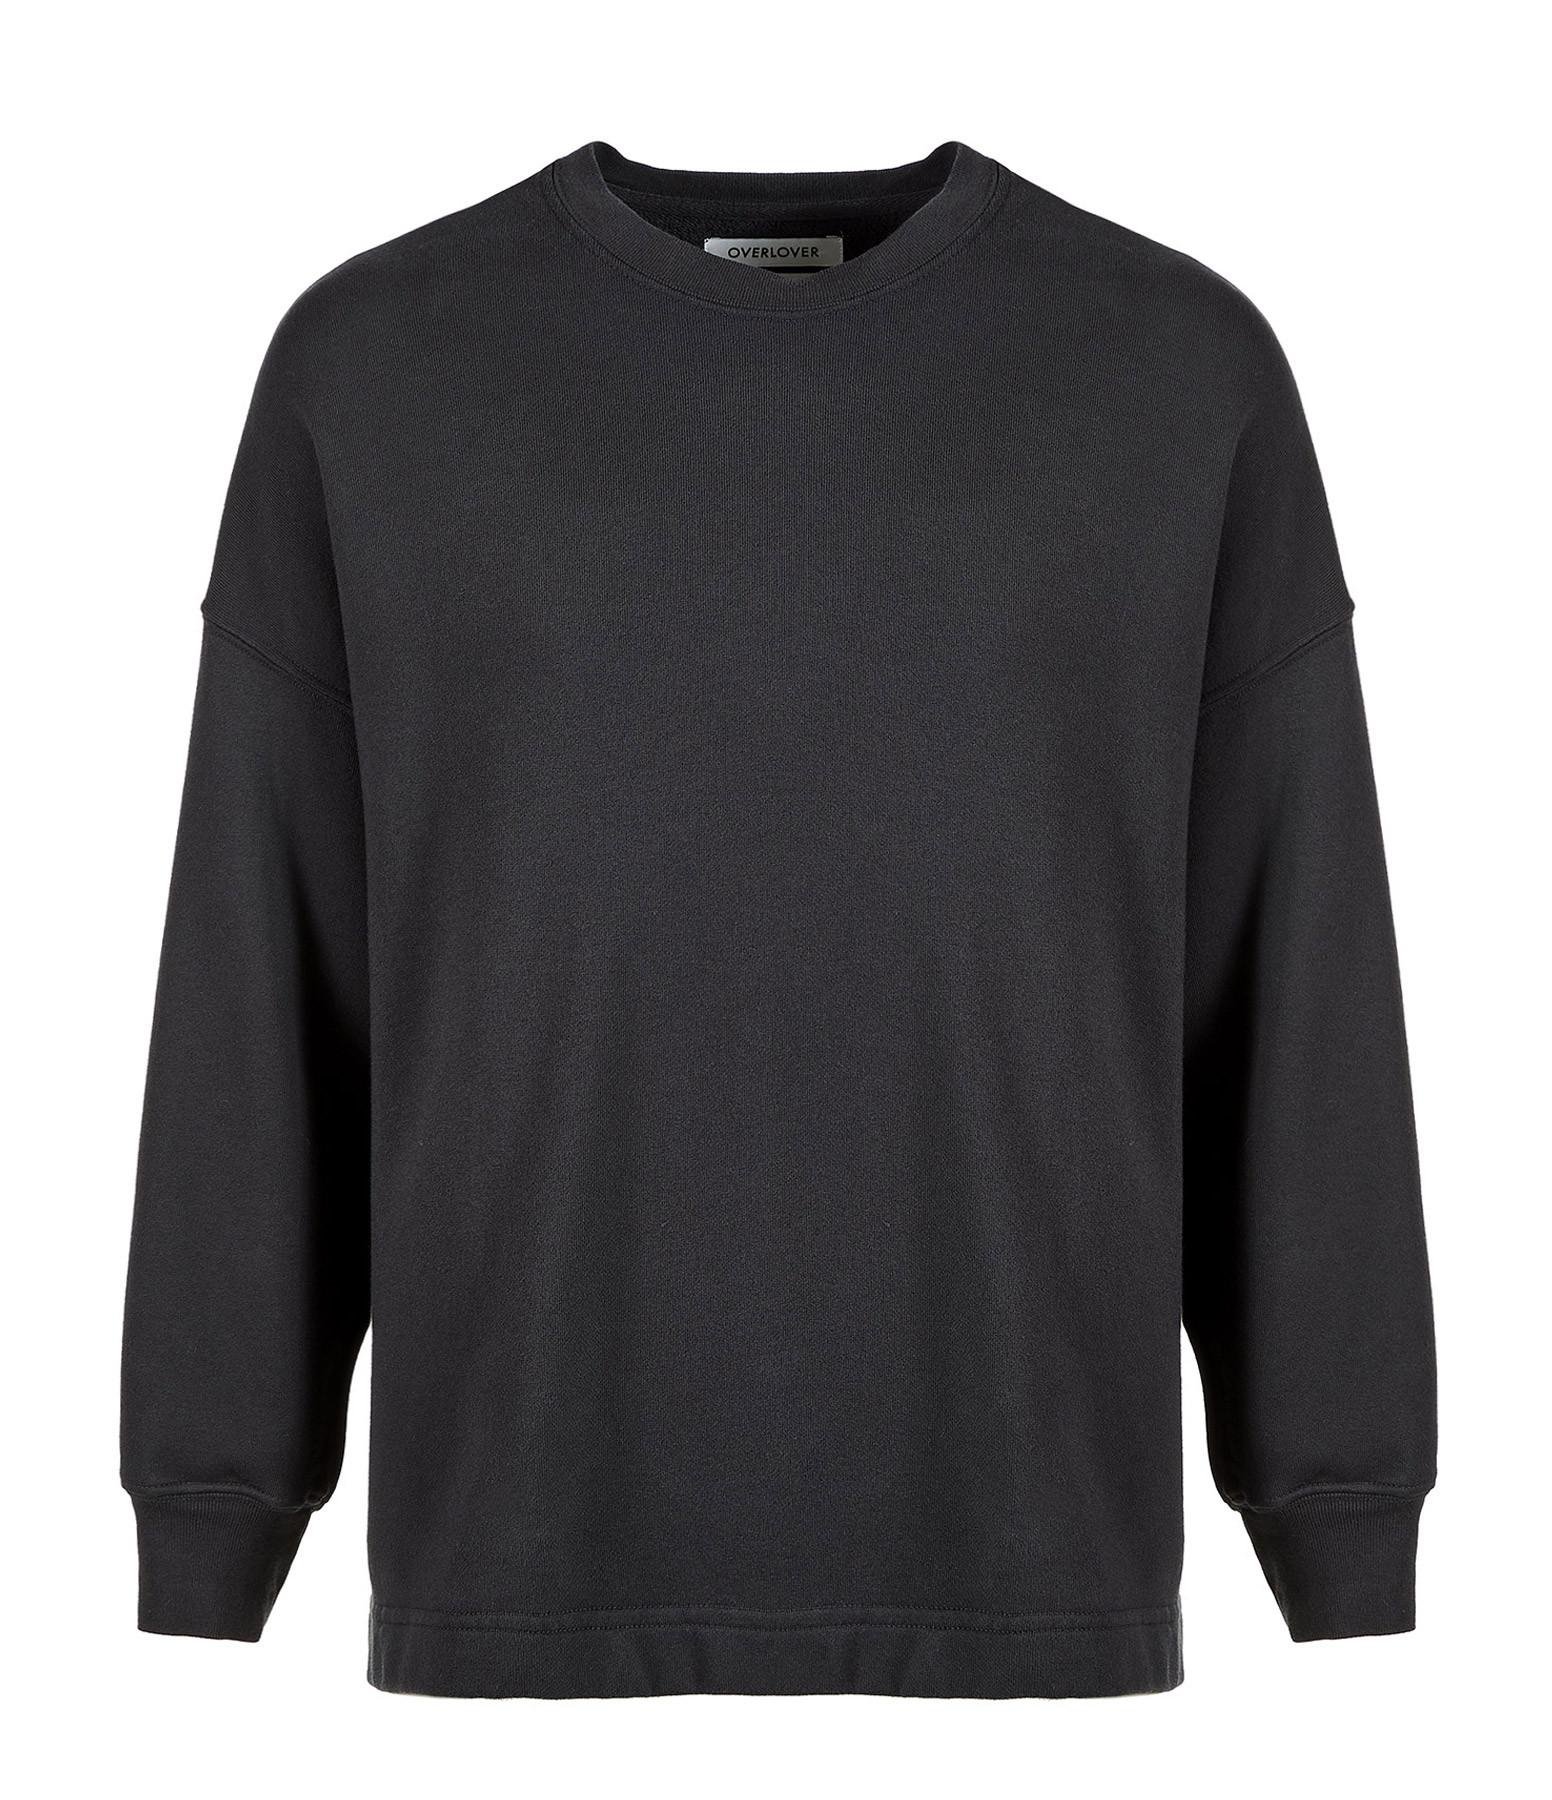 OVERLOVER - Sweatshirt Hollywood Noir